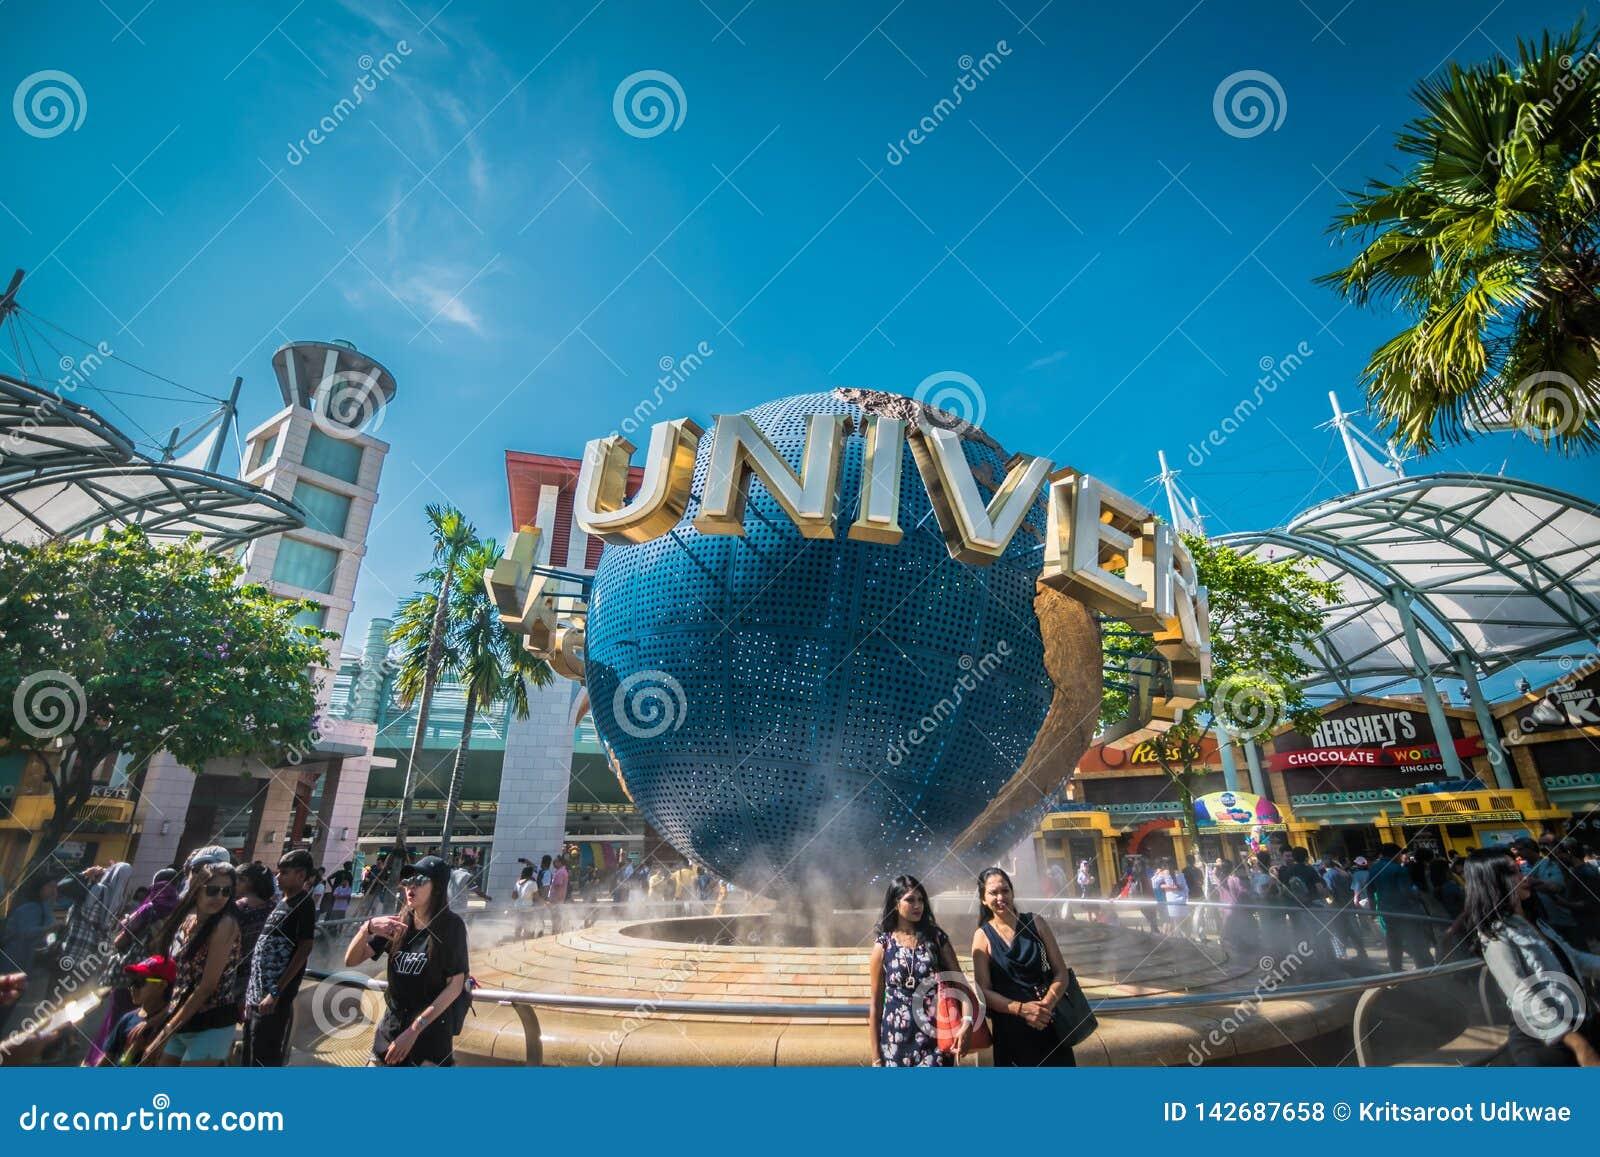 Universal Studio Singapore, a theme park located within Resorts World Sentosa on Sentosa Island, Singapor